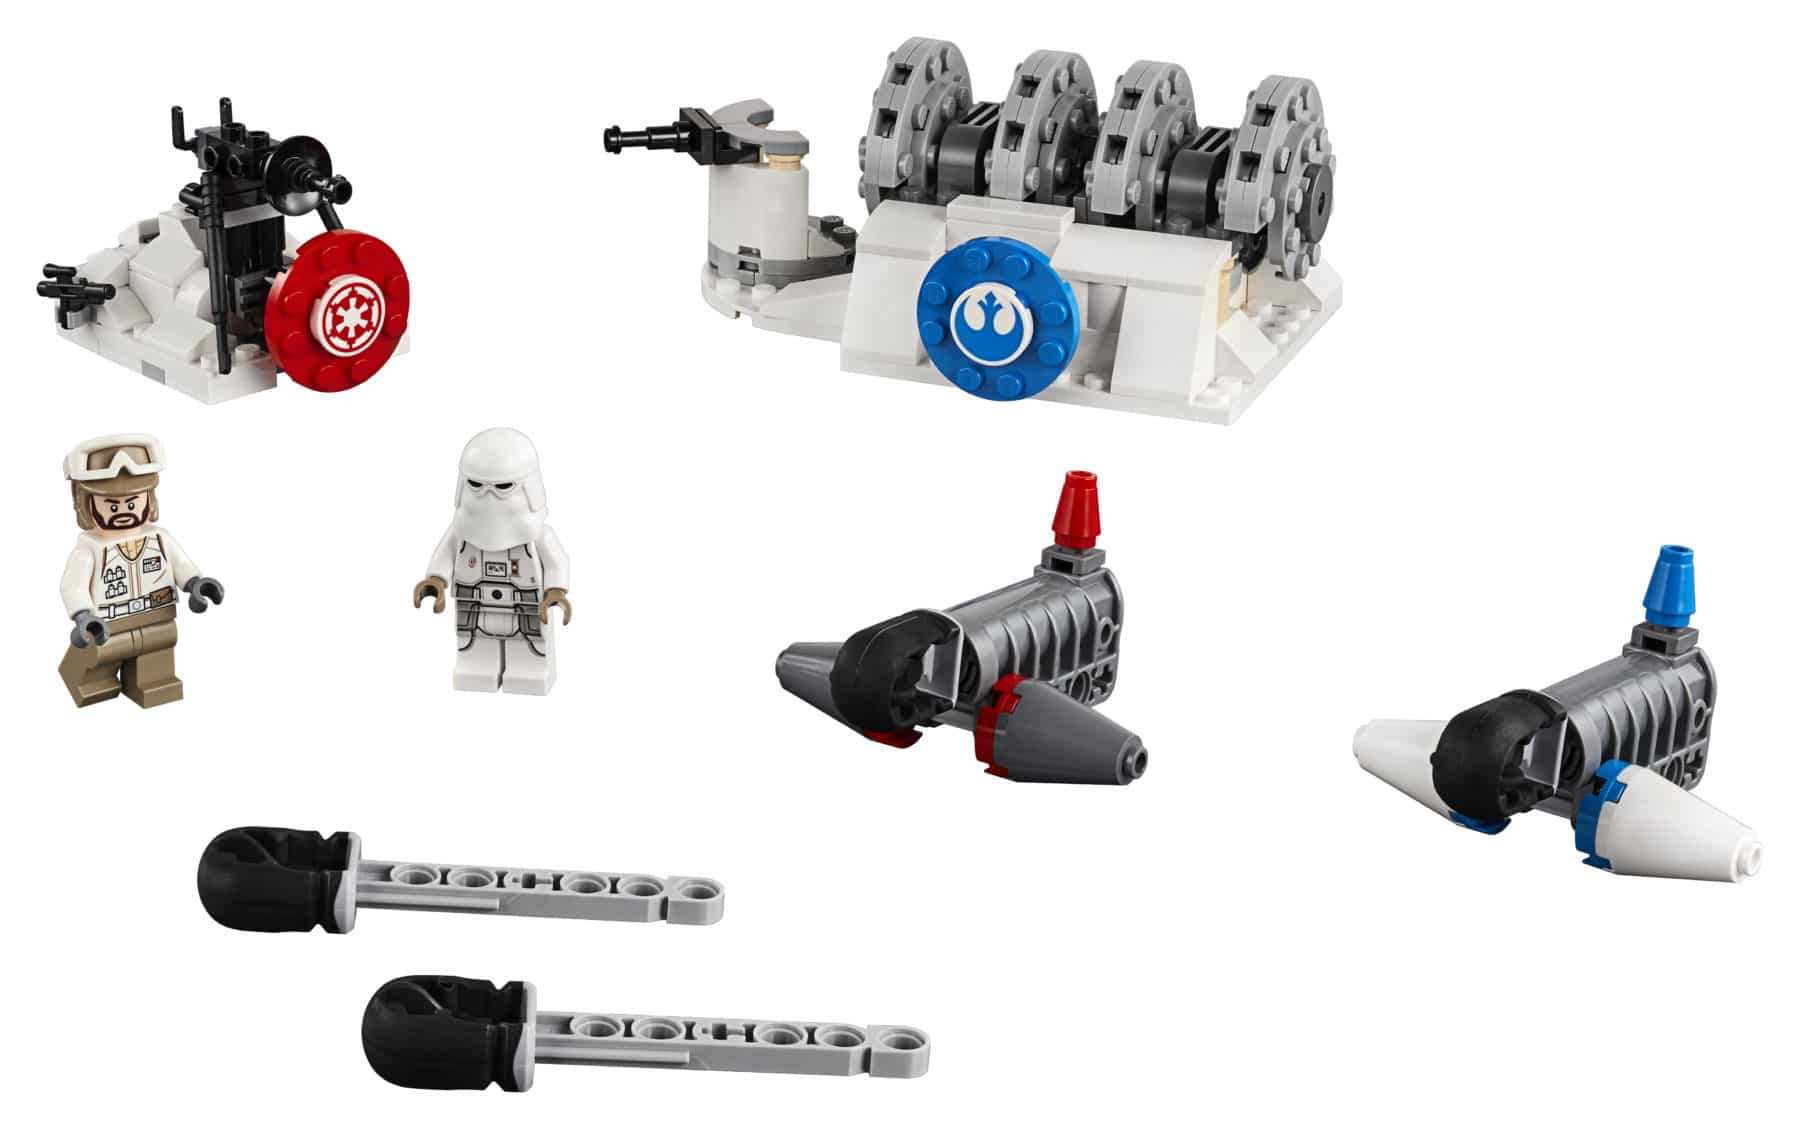 LEGO Star Wars 75239 Action Battle Hoth Generator Attack